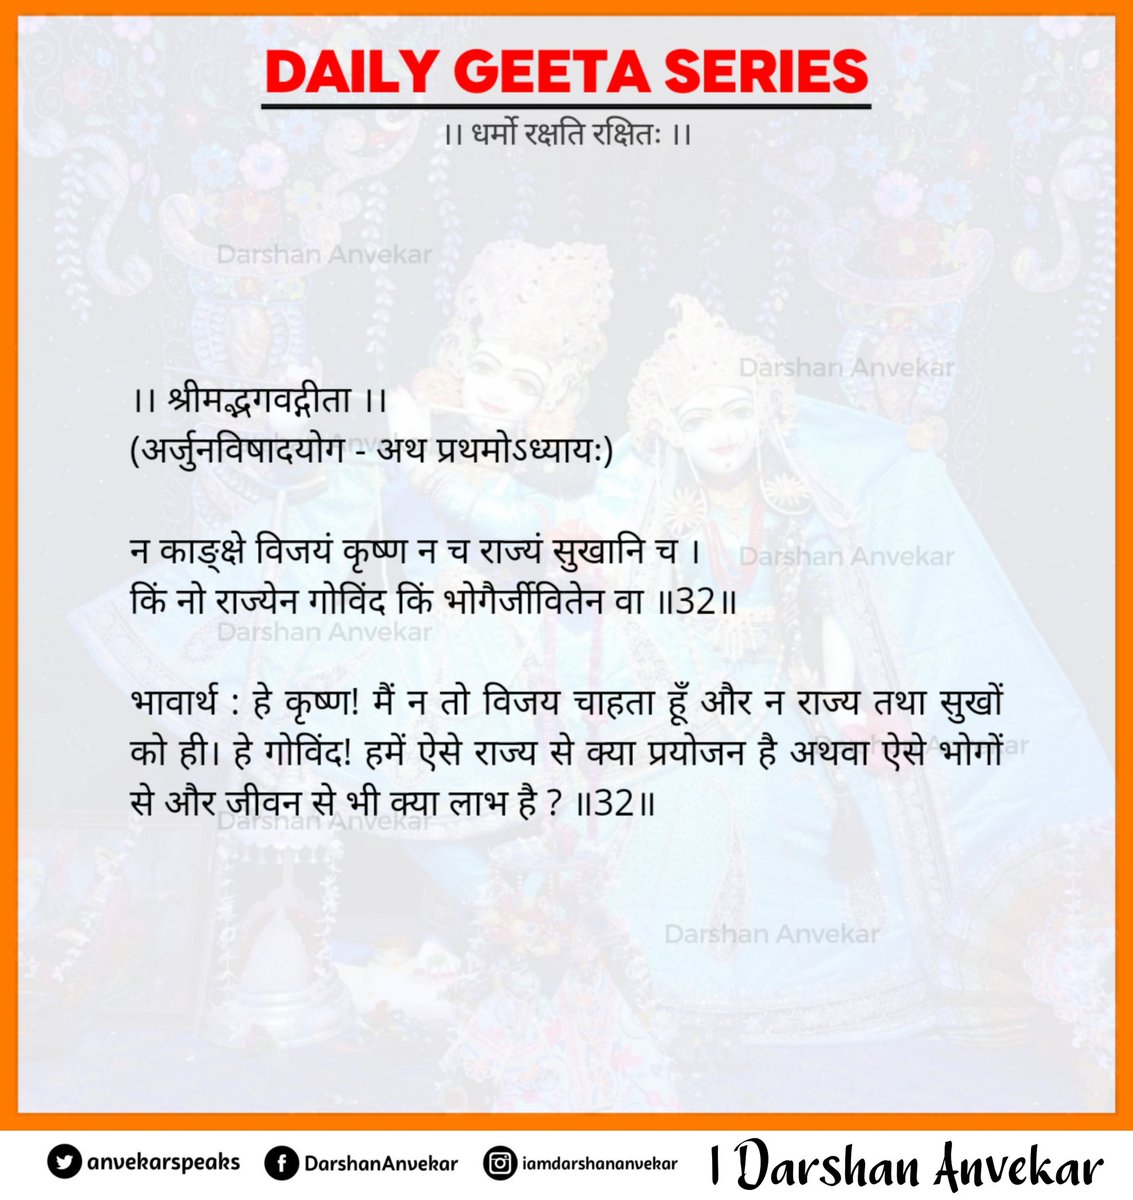 #DailyGeeta #Day28